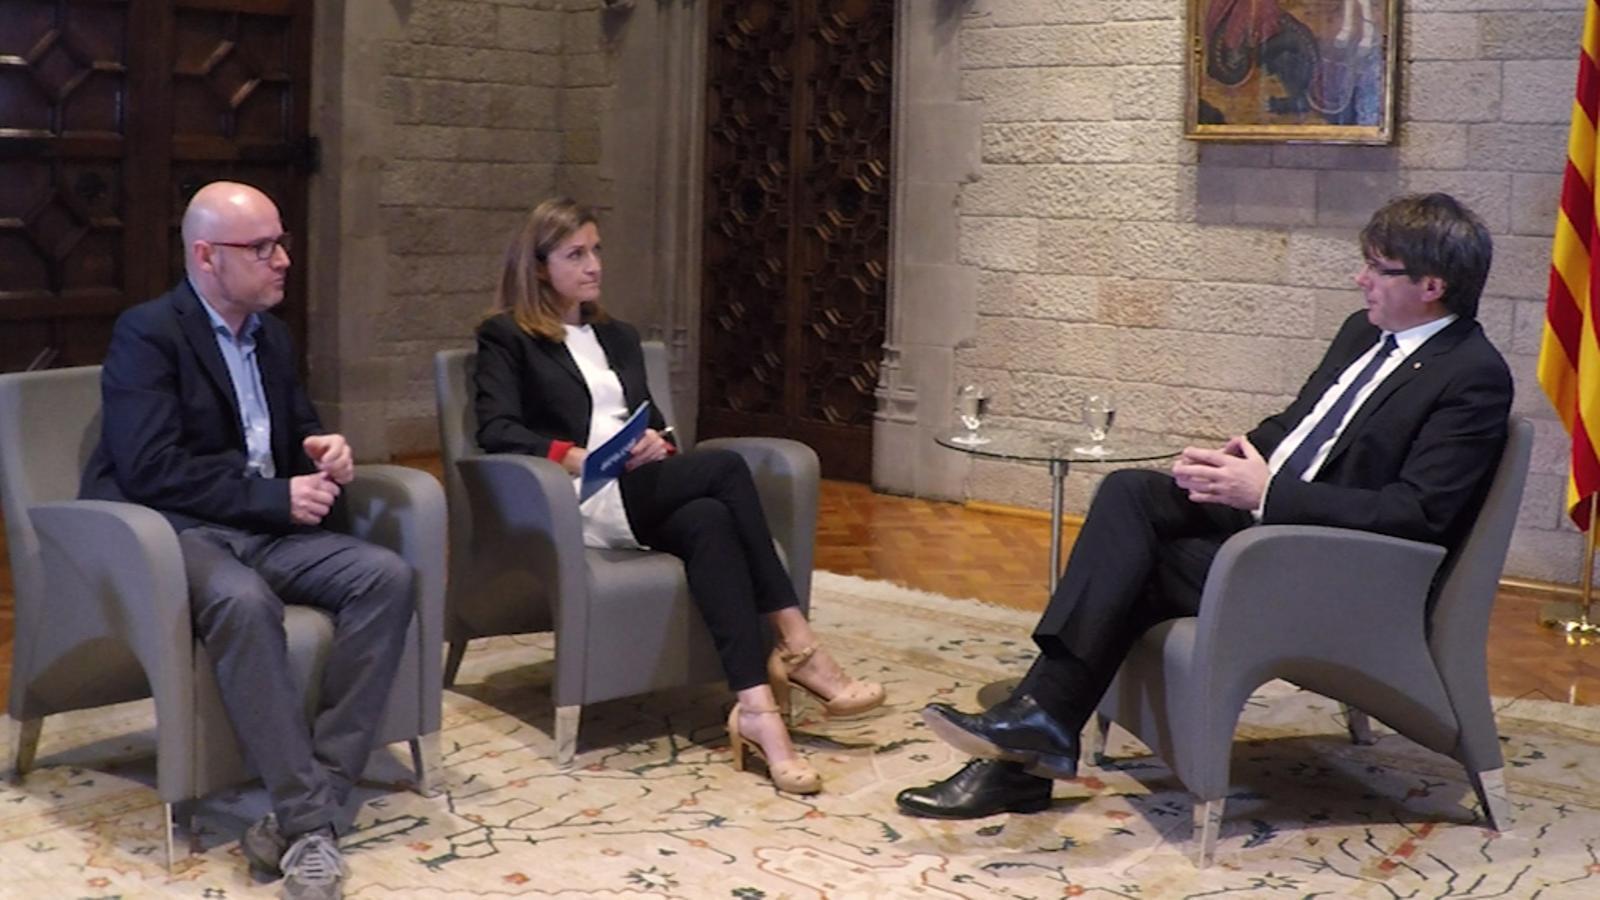 Entrevista d'Esther Vera i David Miró a Carles Puigdemont